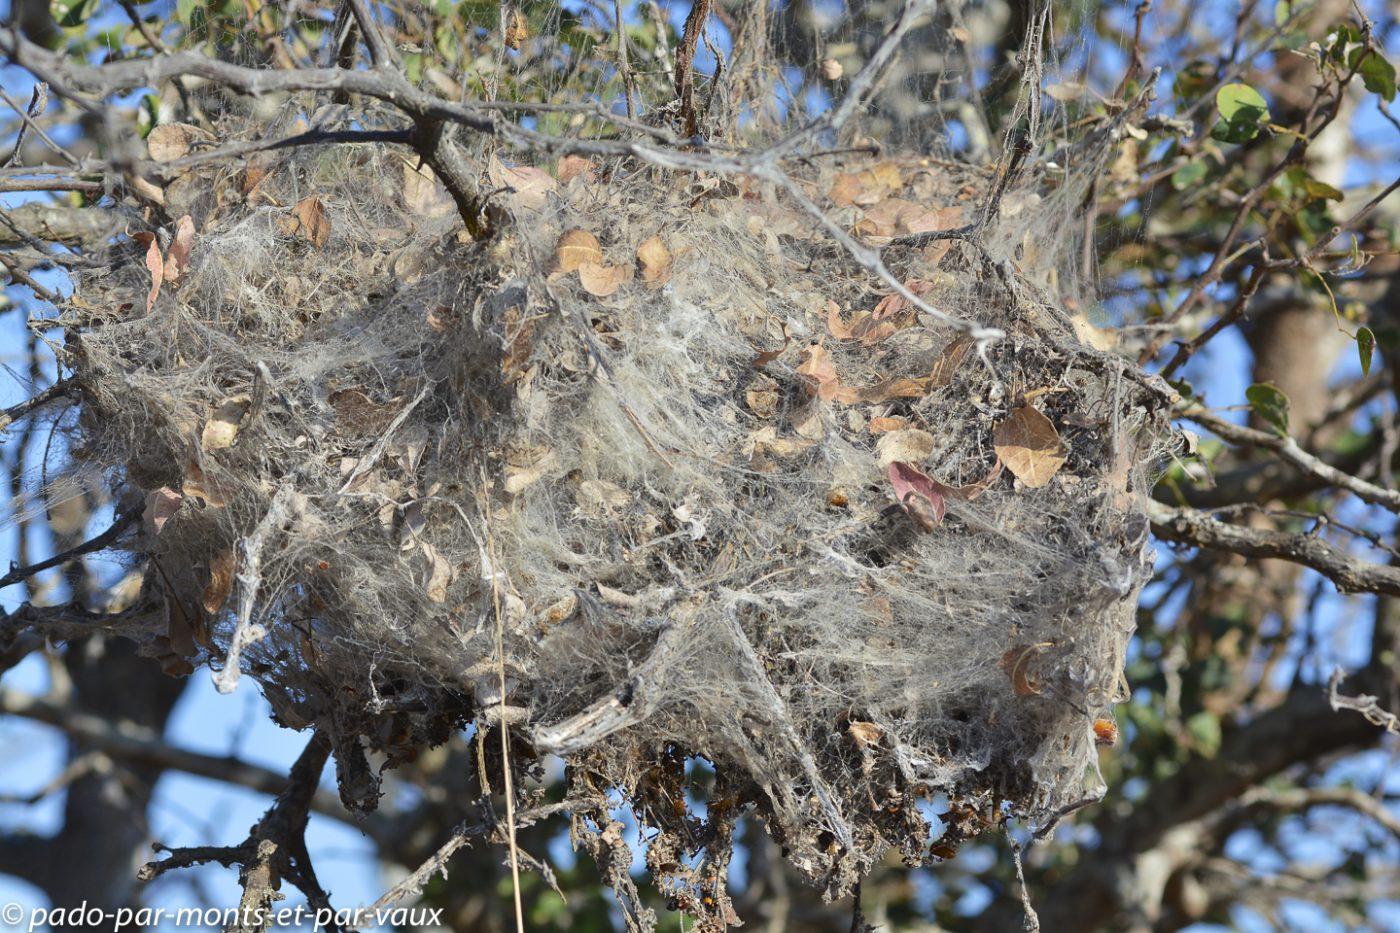 Nid d'araignées sociales